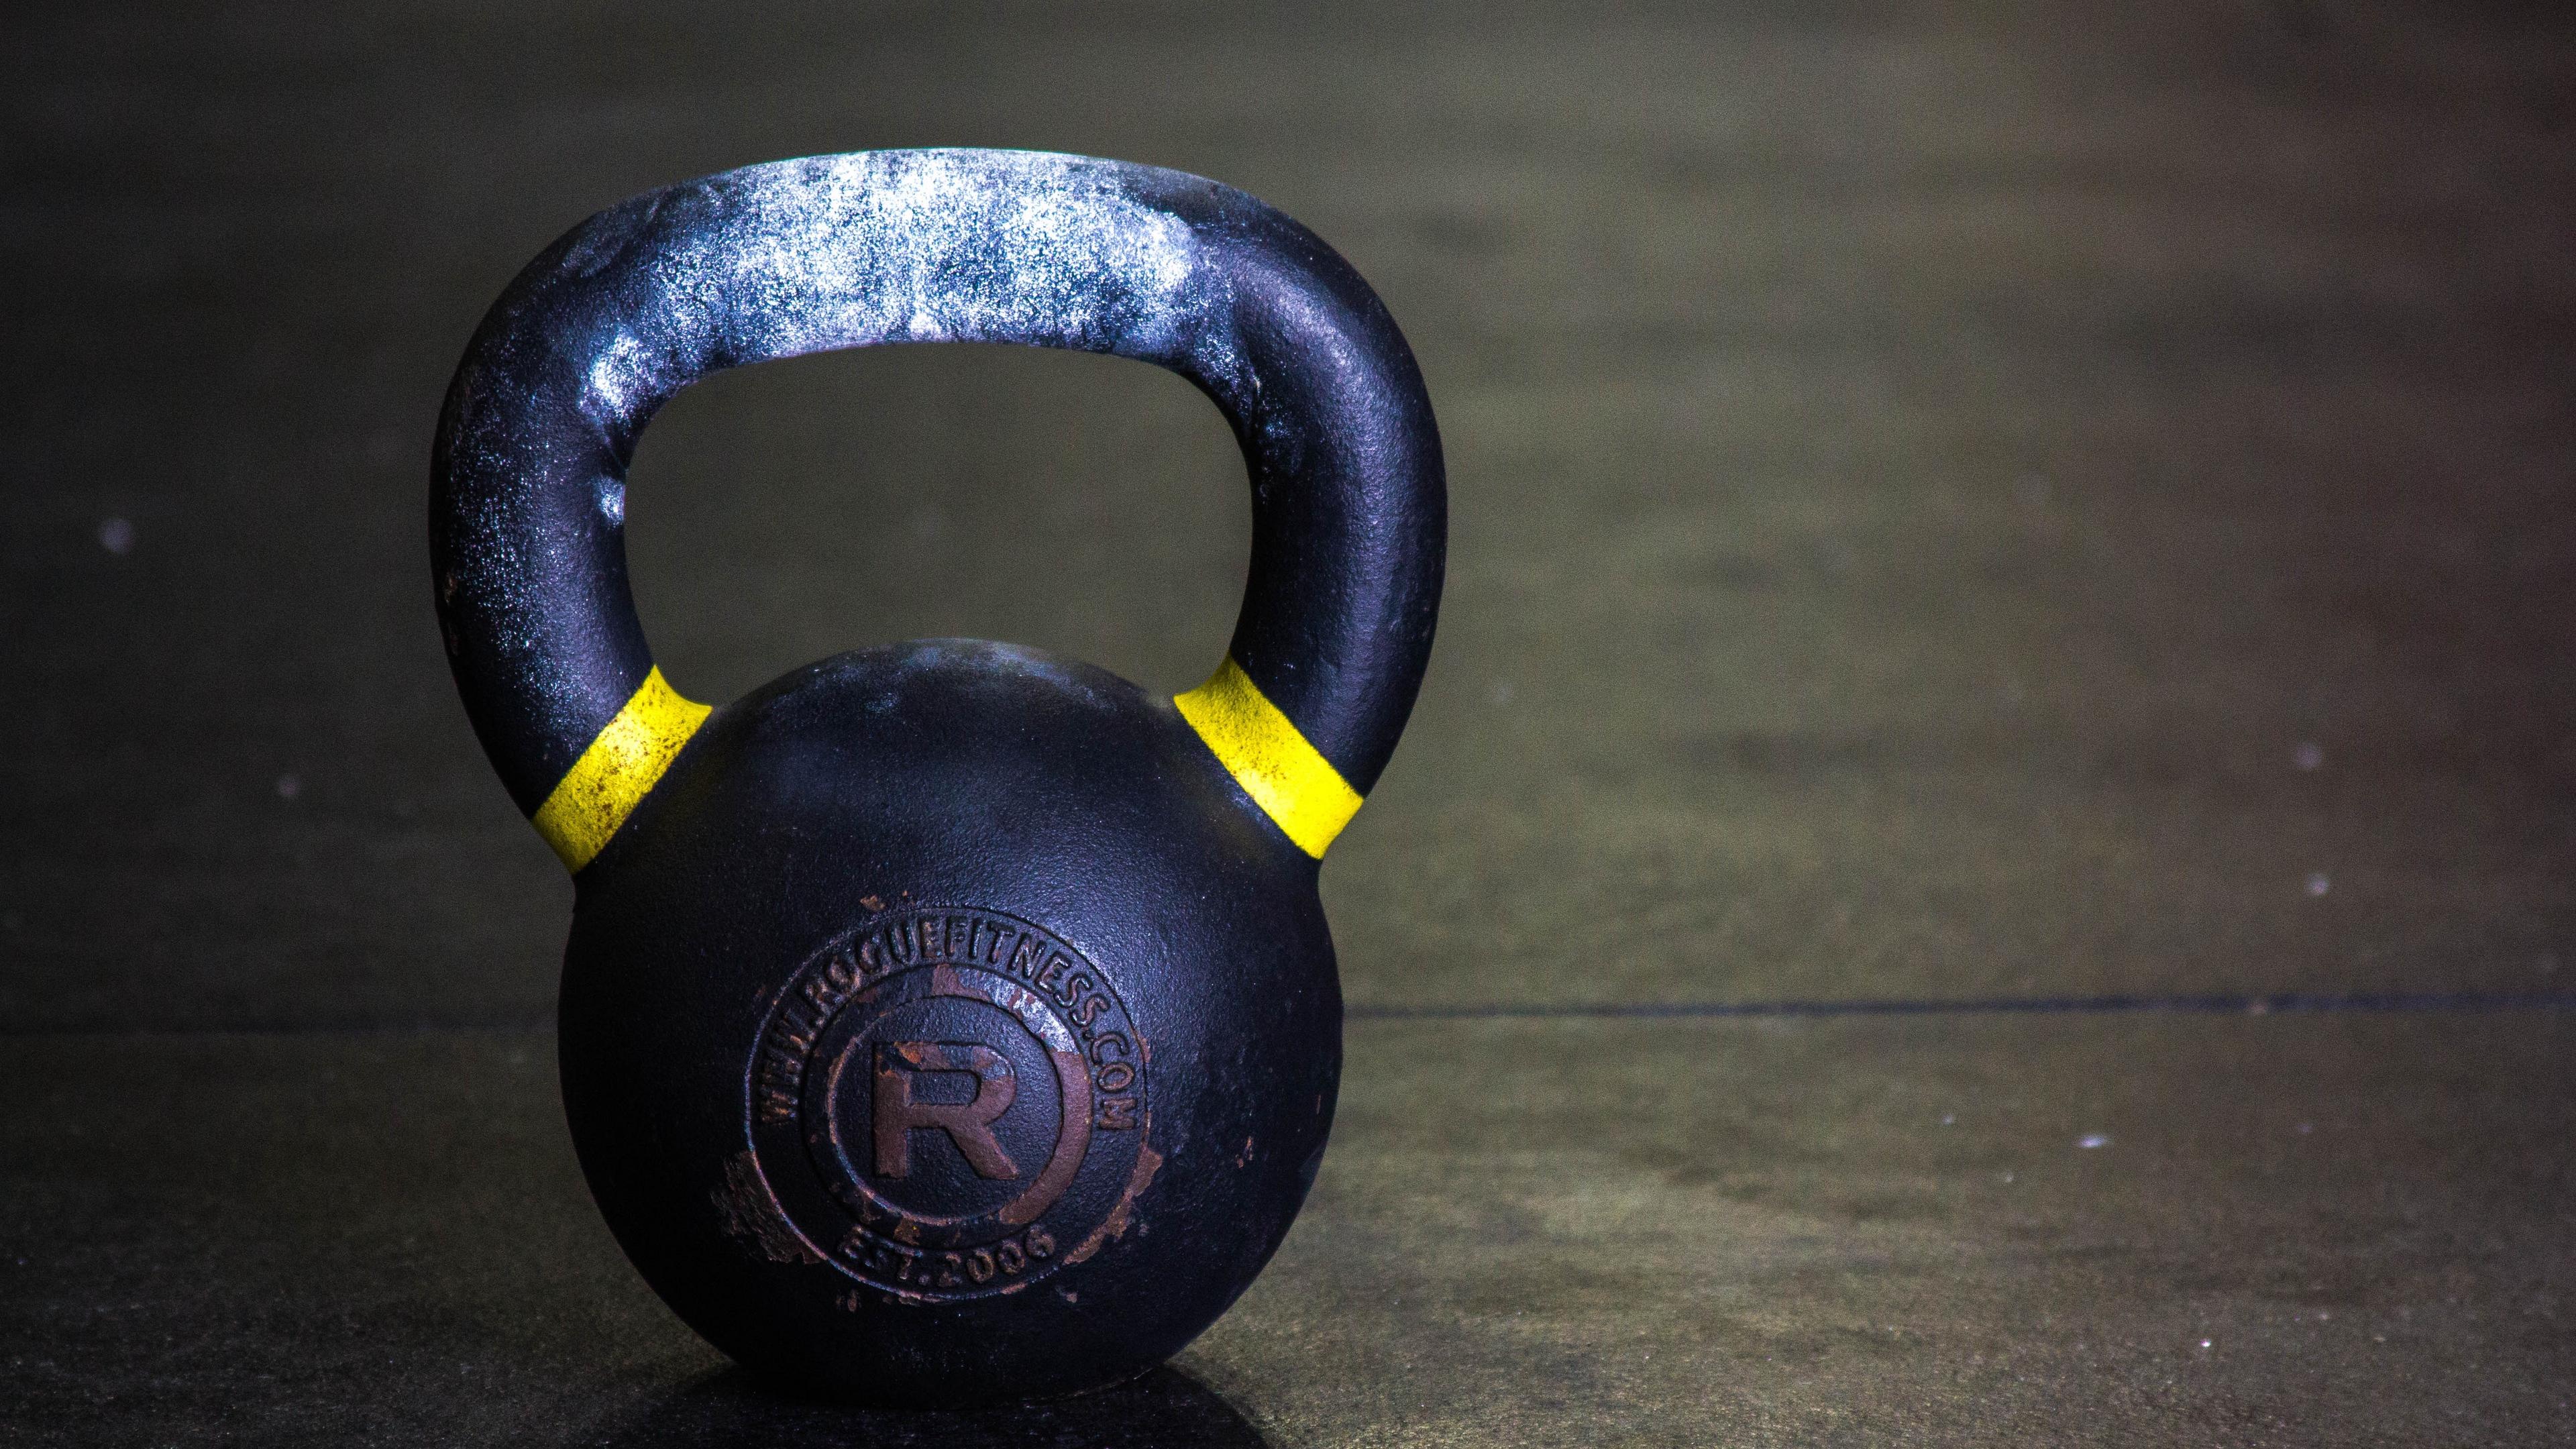 kettlebell gym magnesia workouts 4k 1540062650 - kettlebell, gym, magnesia, workouts 4k - magnesia, kettlebell, gym